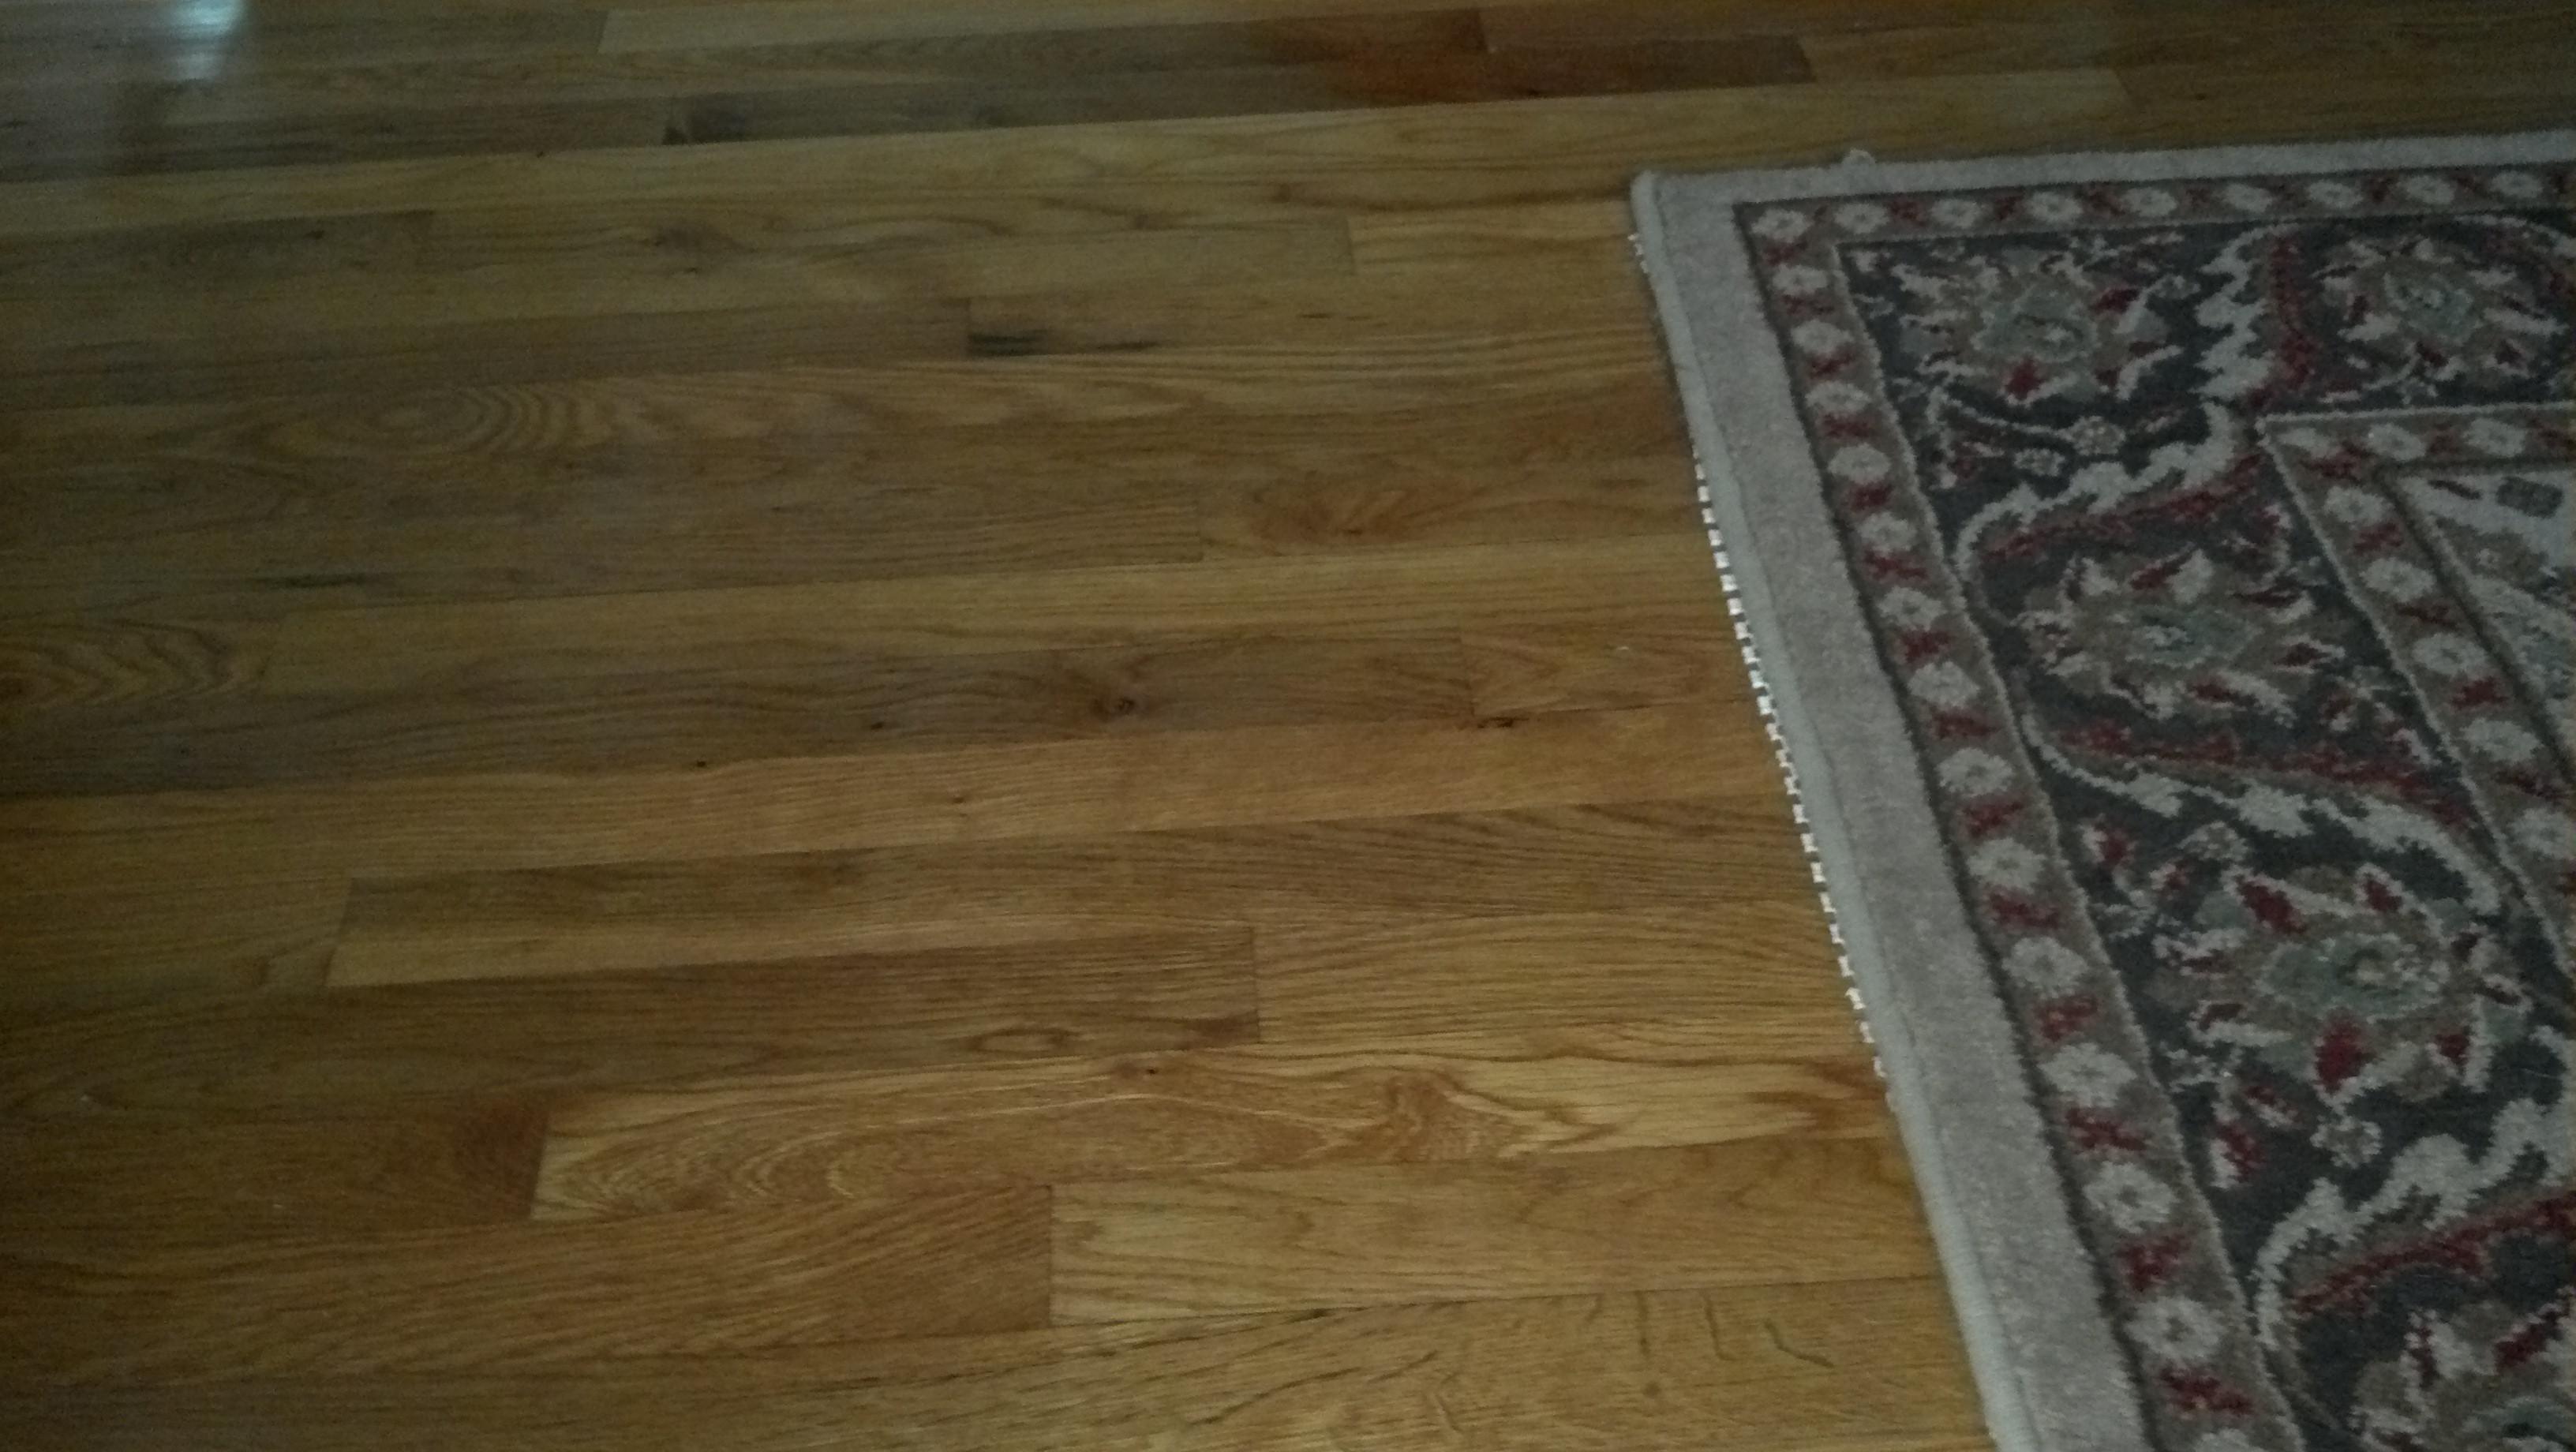 hardwood floor refinishing hampton roads of floor magicians inc offers hardwood and laminate flooring inside floor magicians offers custom hardwood floors